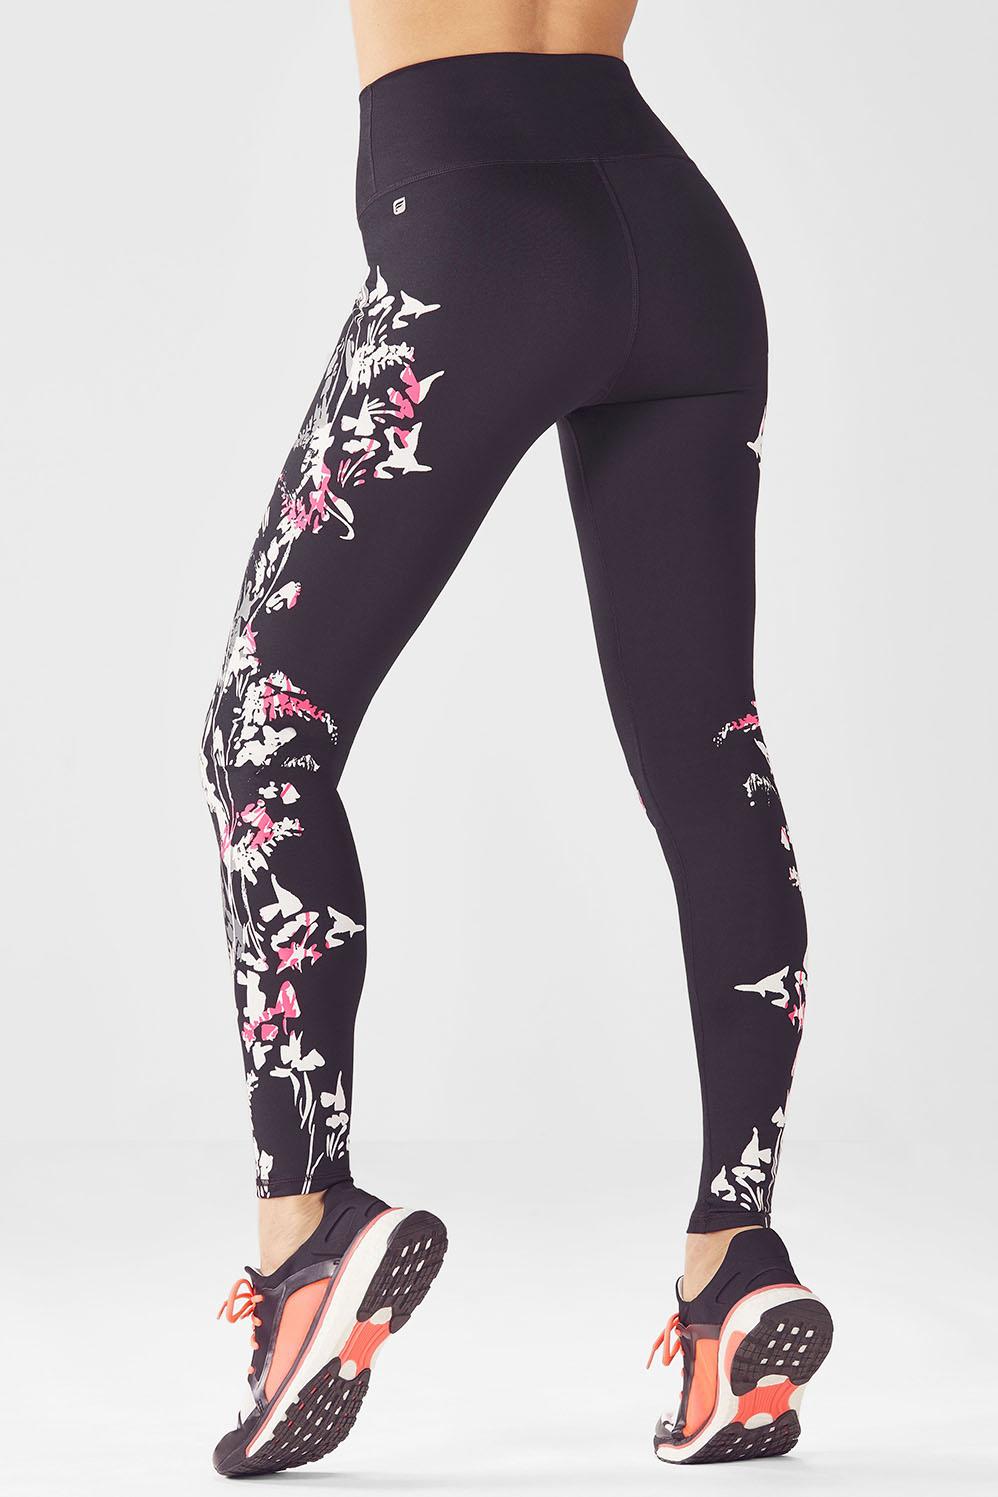 2f19b99768 High-Waisted Printed PowerHold® Leggings - Pop Coral Pretty Punk